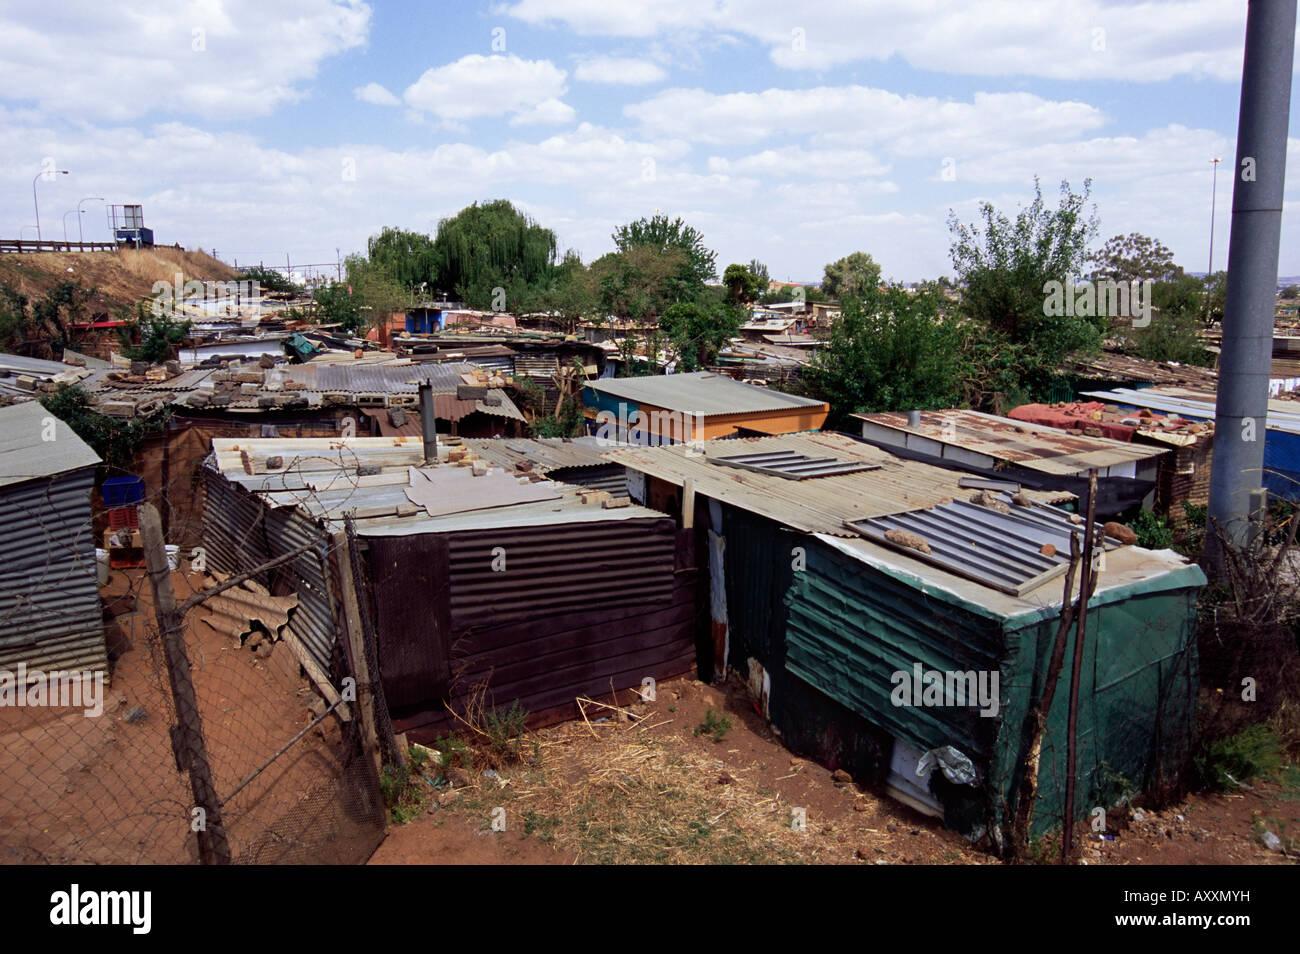 Baracche, Soweto, Johannesburg, Sud Africa e Africa Immagini Stock